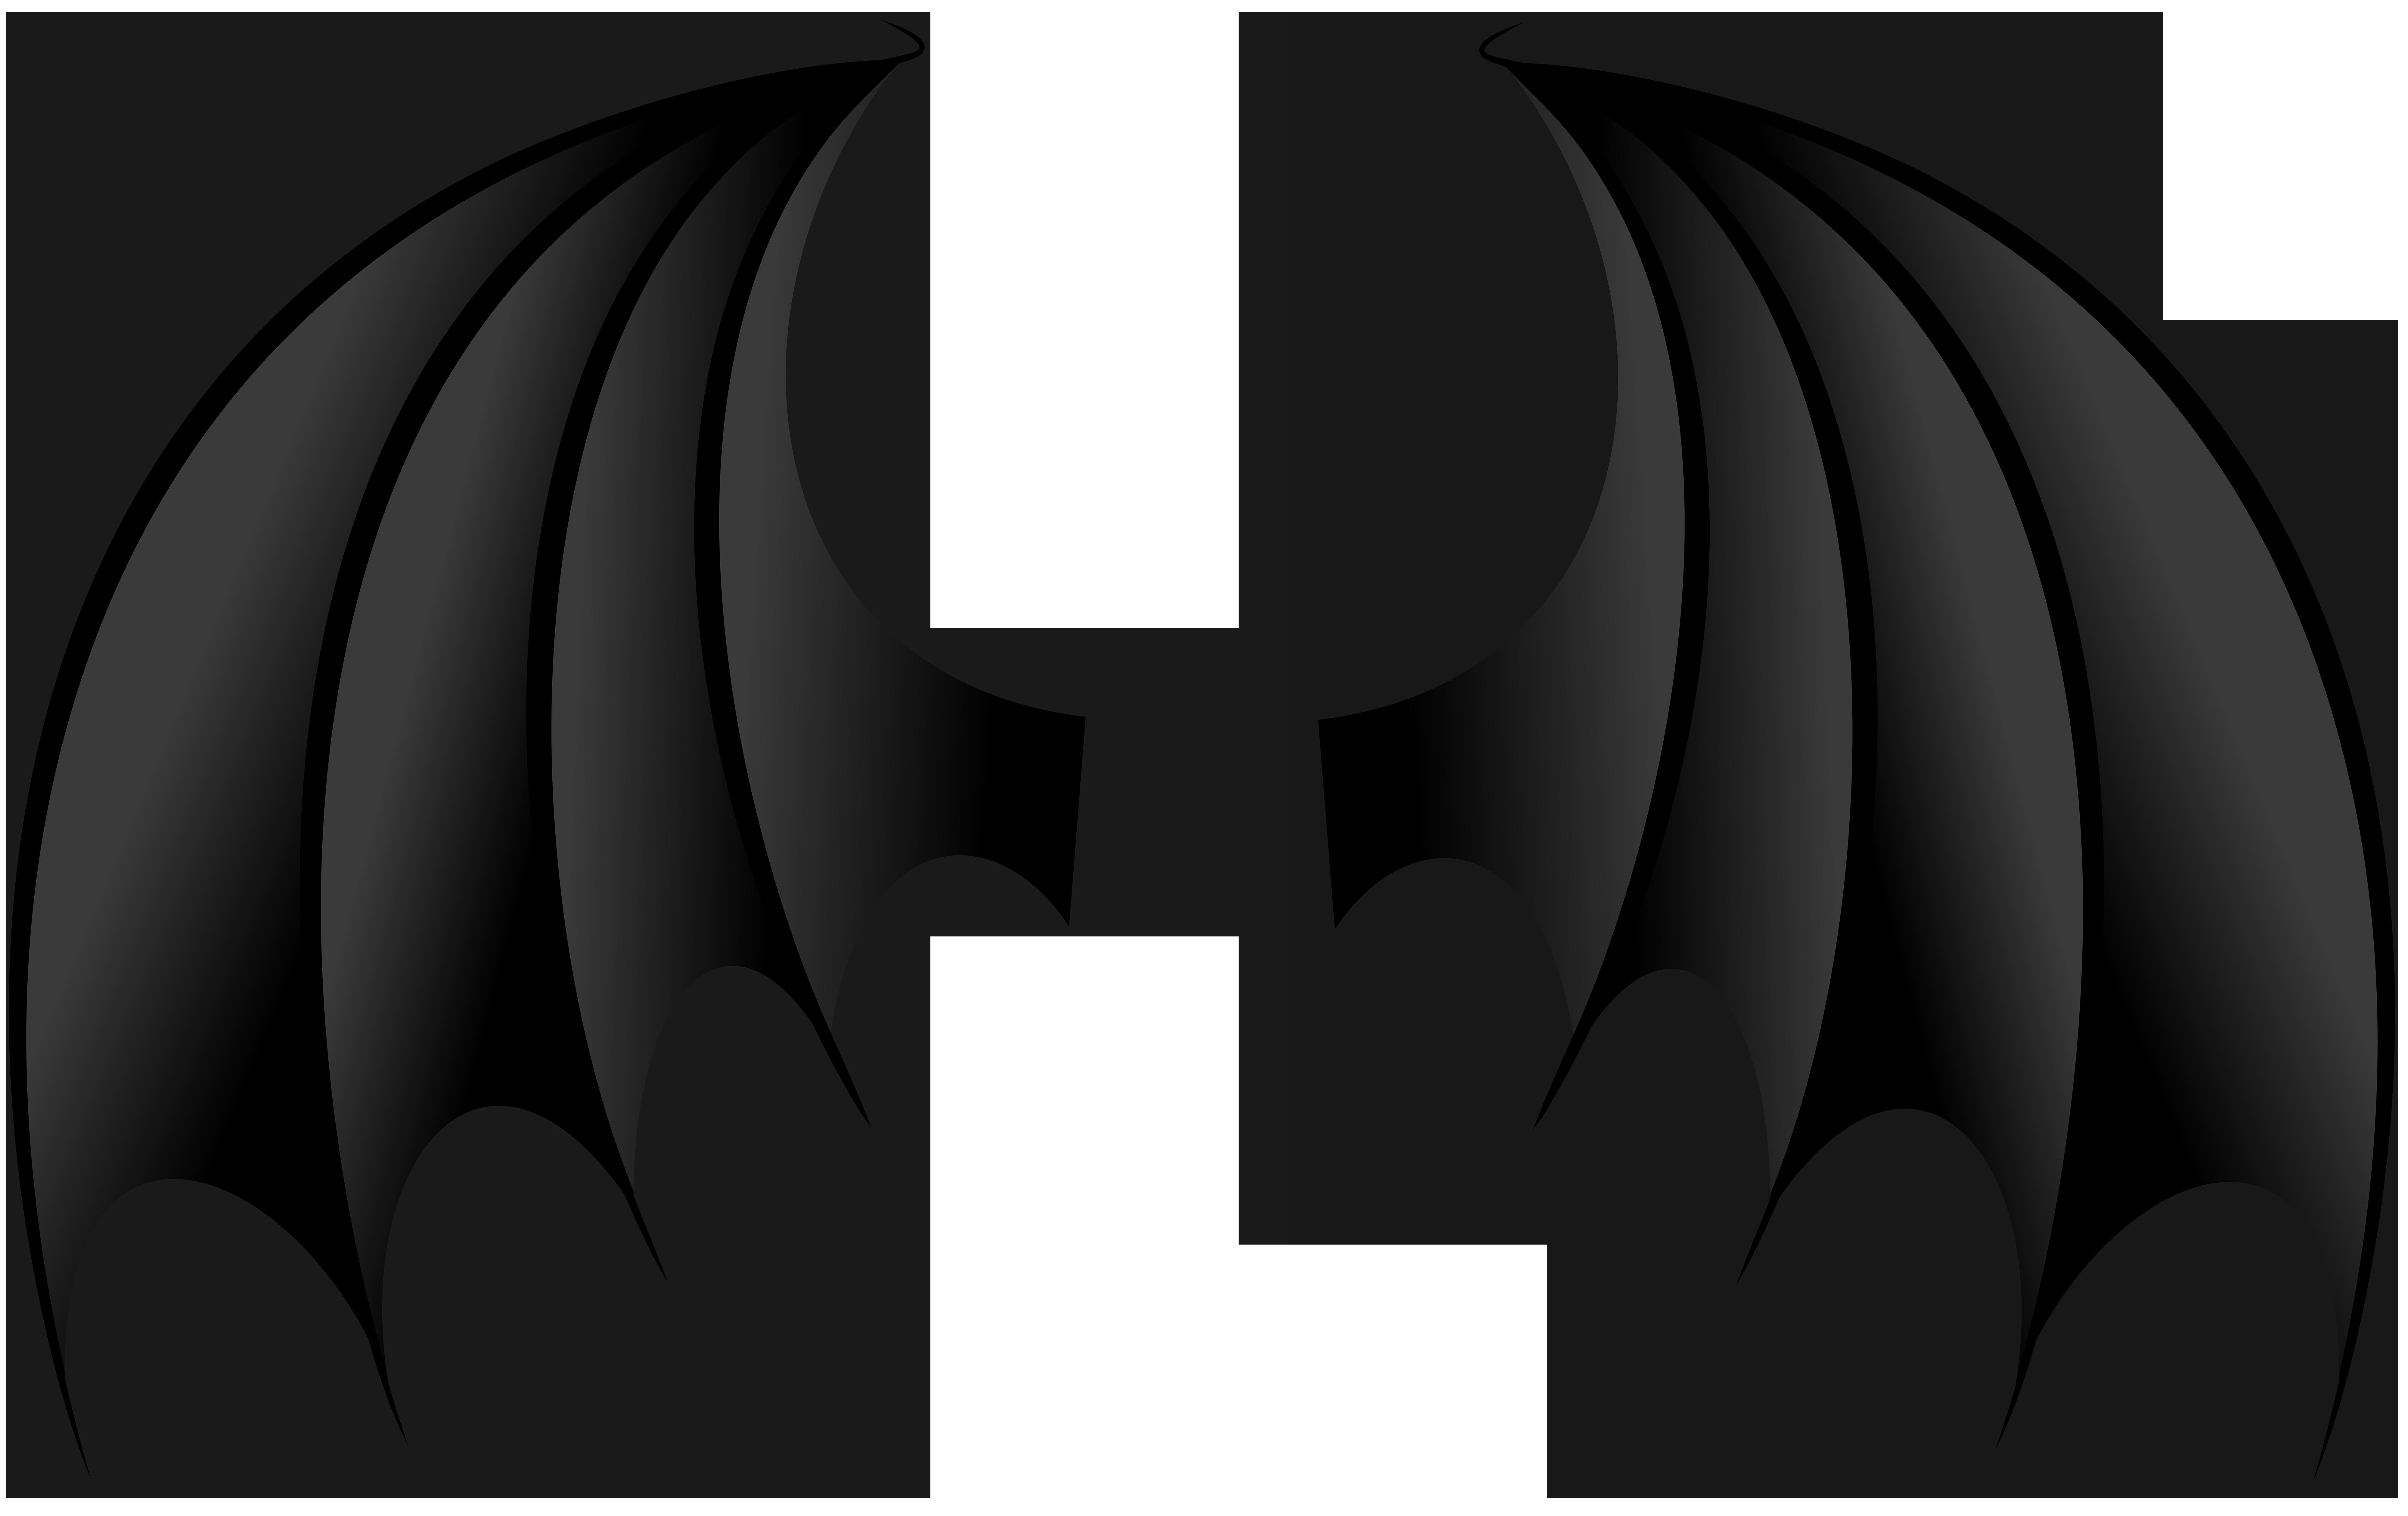 Demon Wings PNG Clip Art Image.